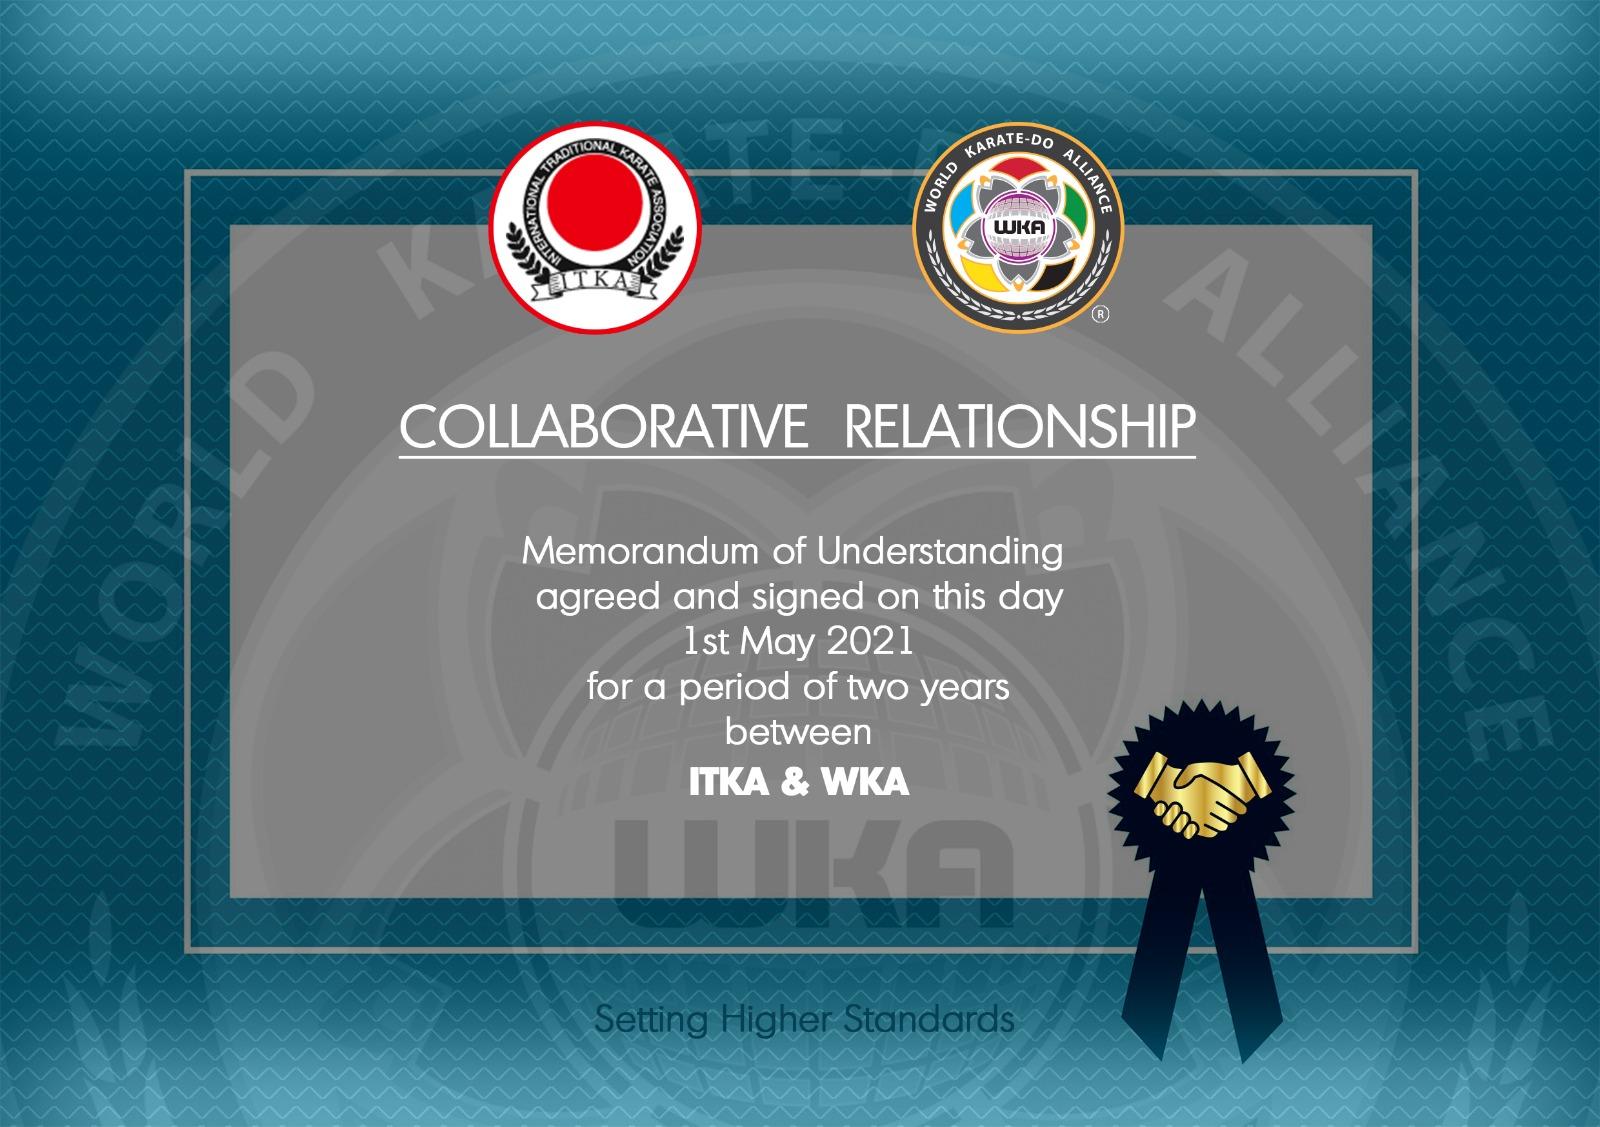 Collaborative-Relationship_ITKA